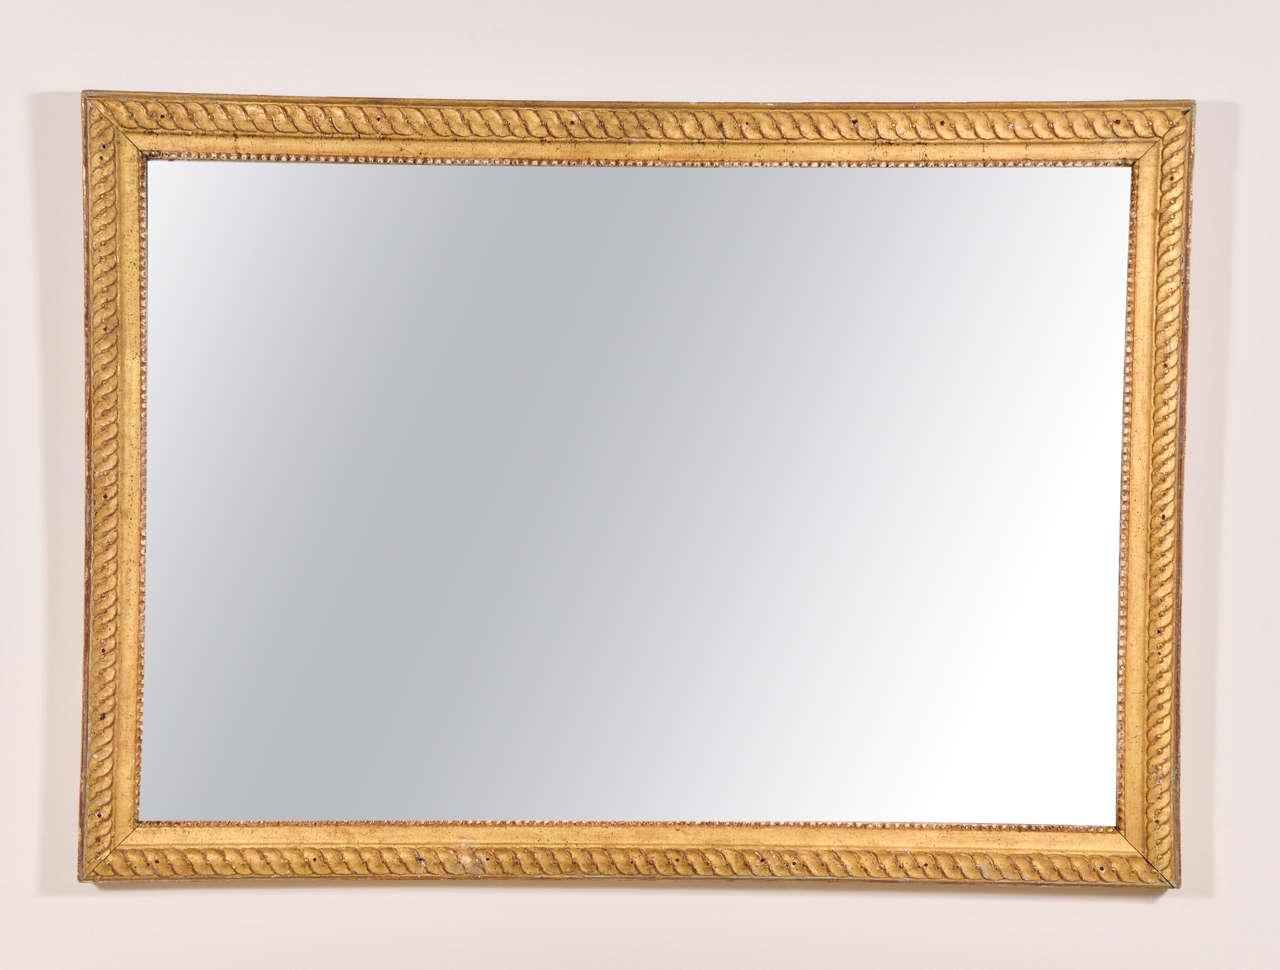 Very nice Louis XVI mirror, nice carving and gilding. The mirror is original.